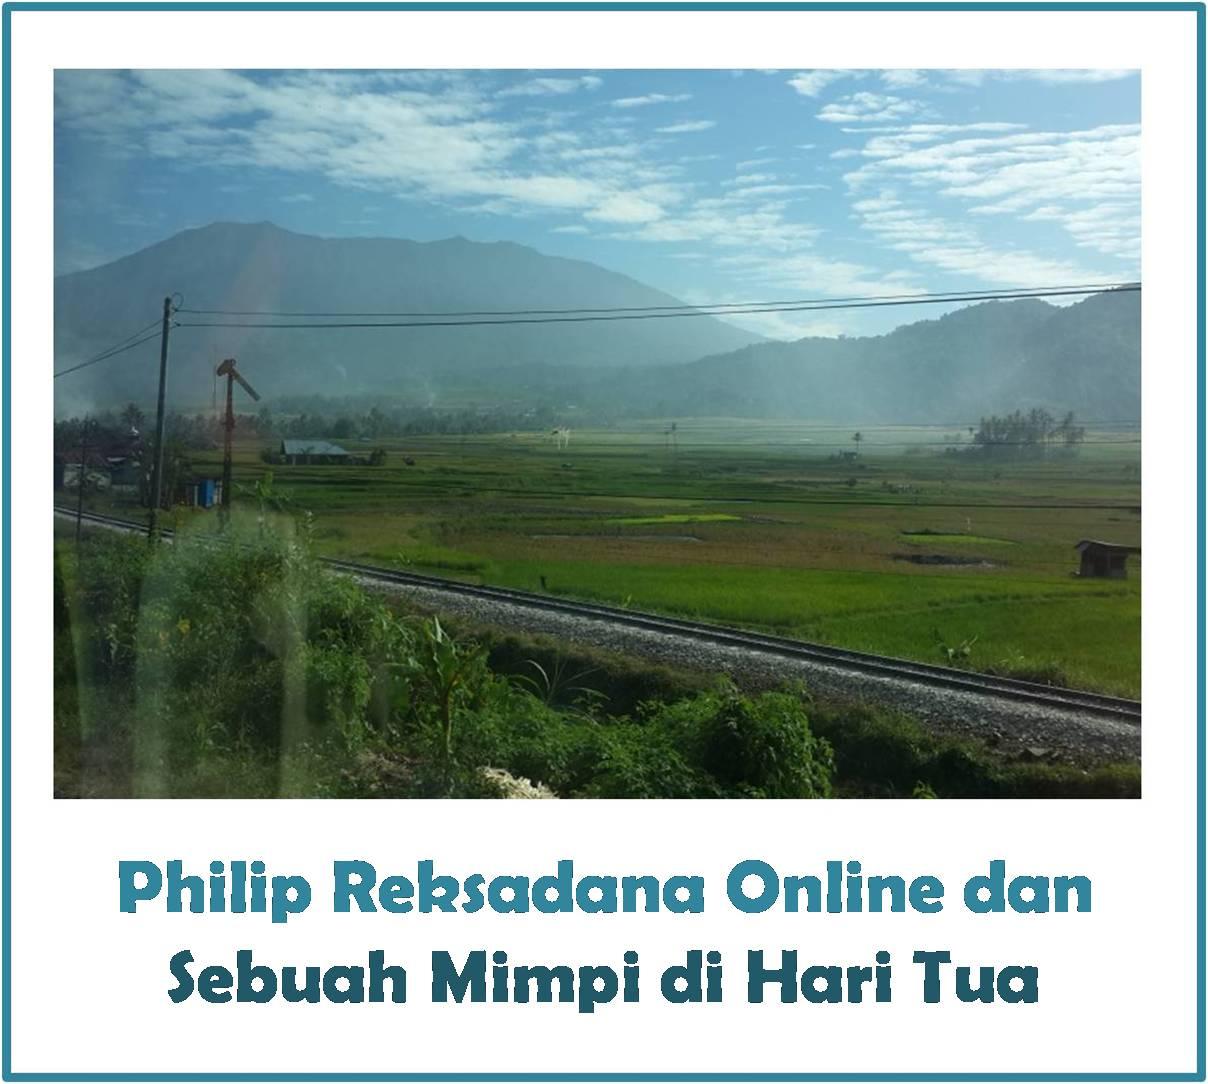 Philip Reksadana Online